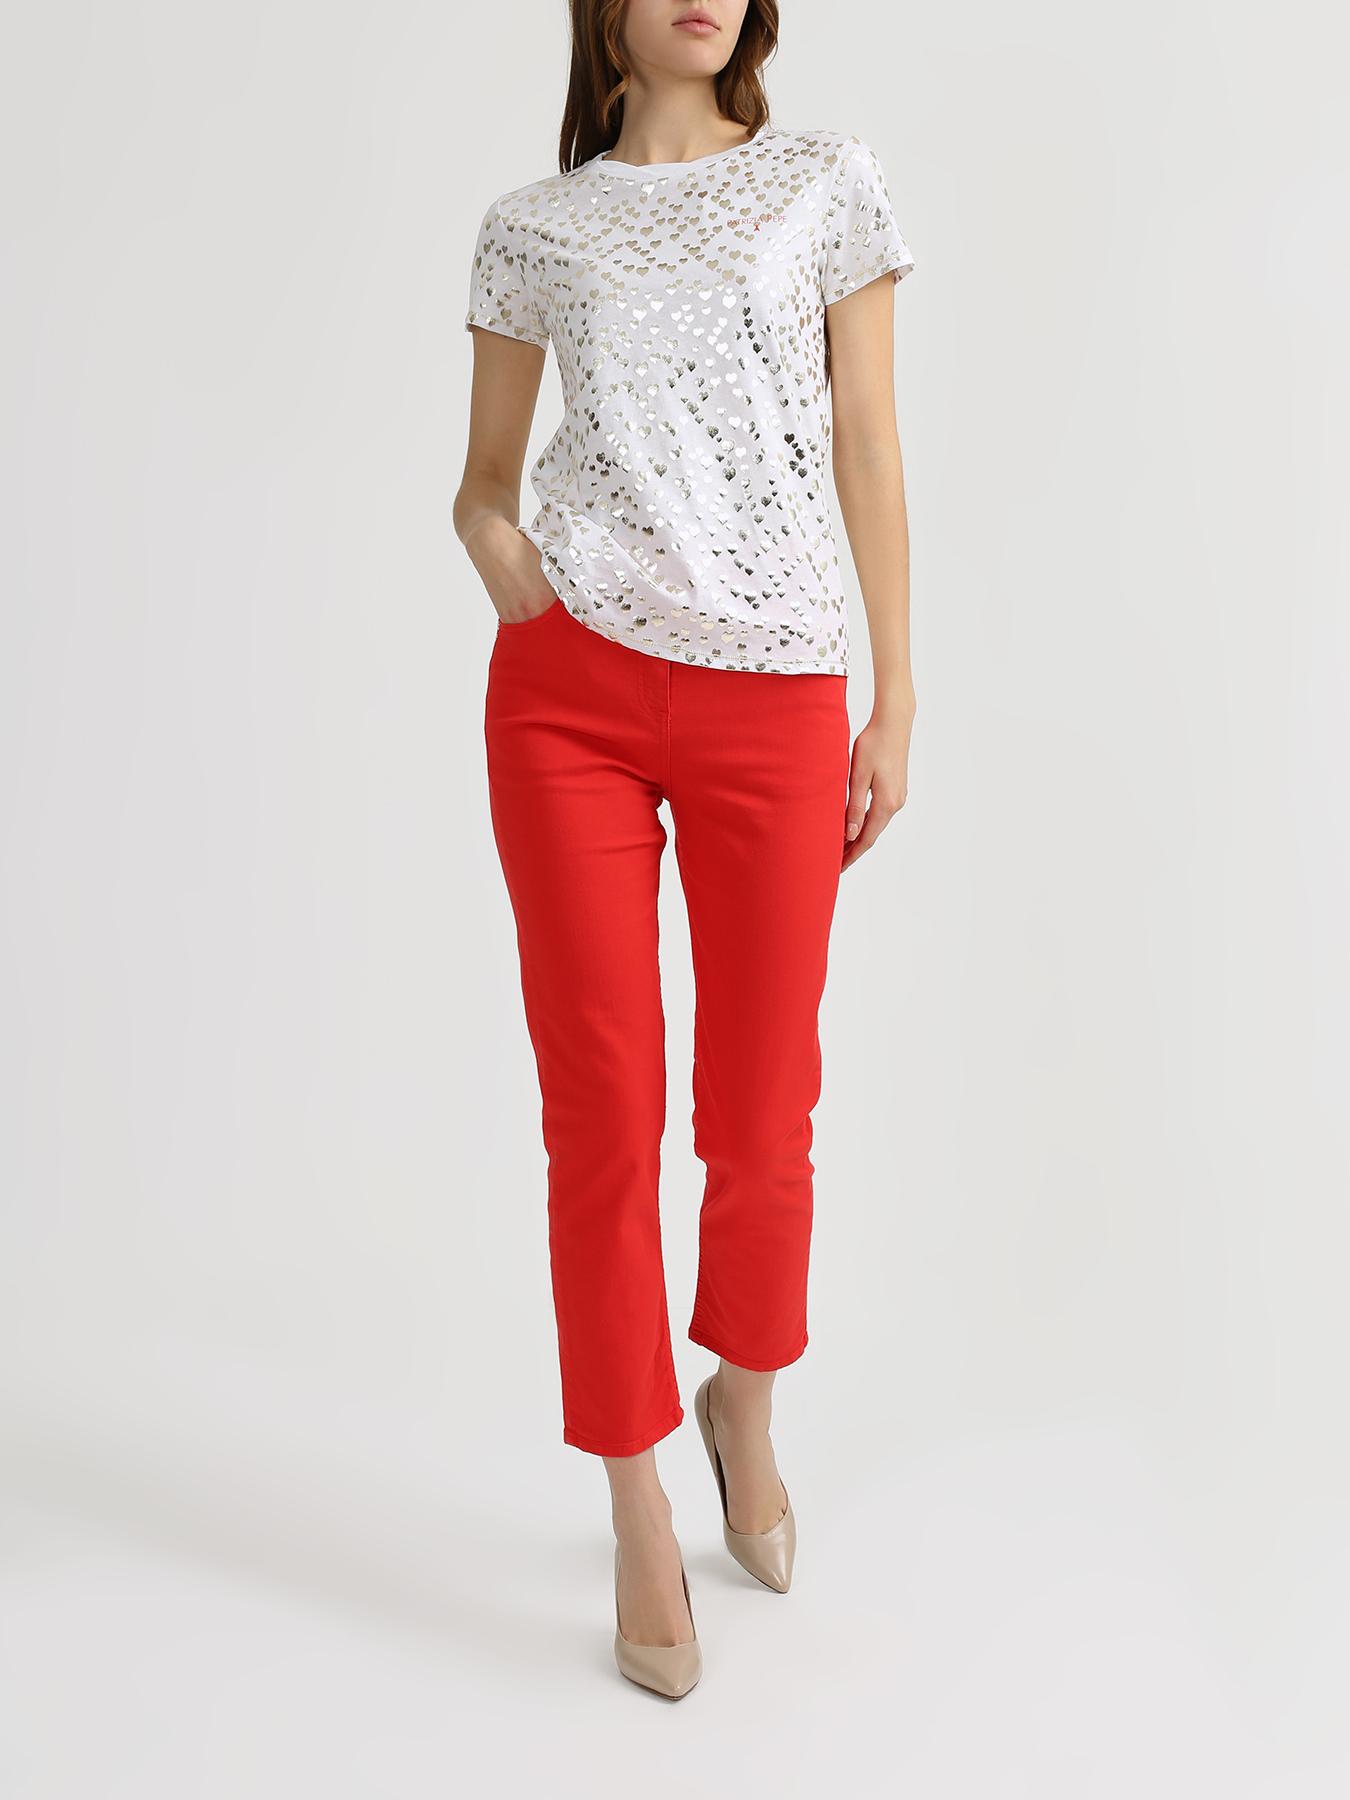 Брюки Patrizia Pepe Укороченные джинсы джинсы patrizia pepe размер 152 0325 белый зеленый